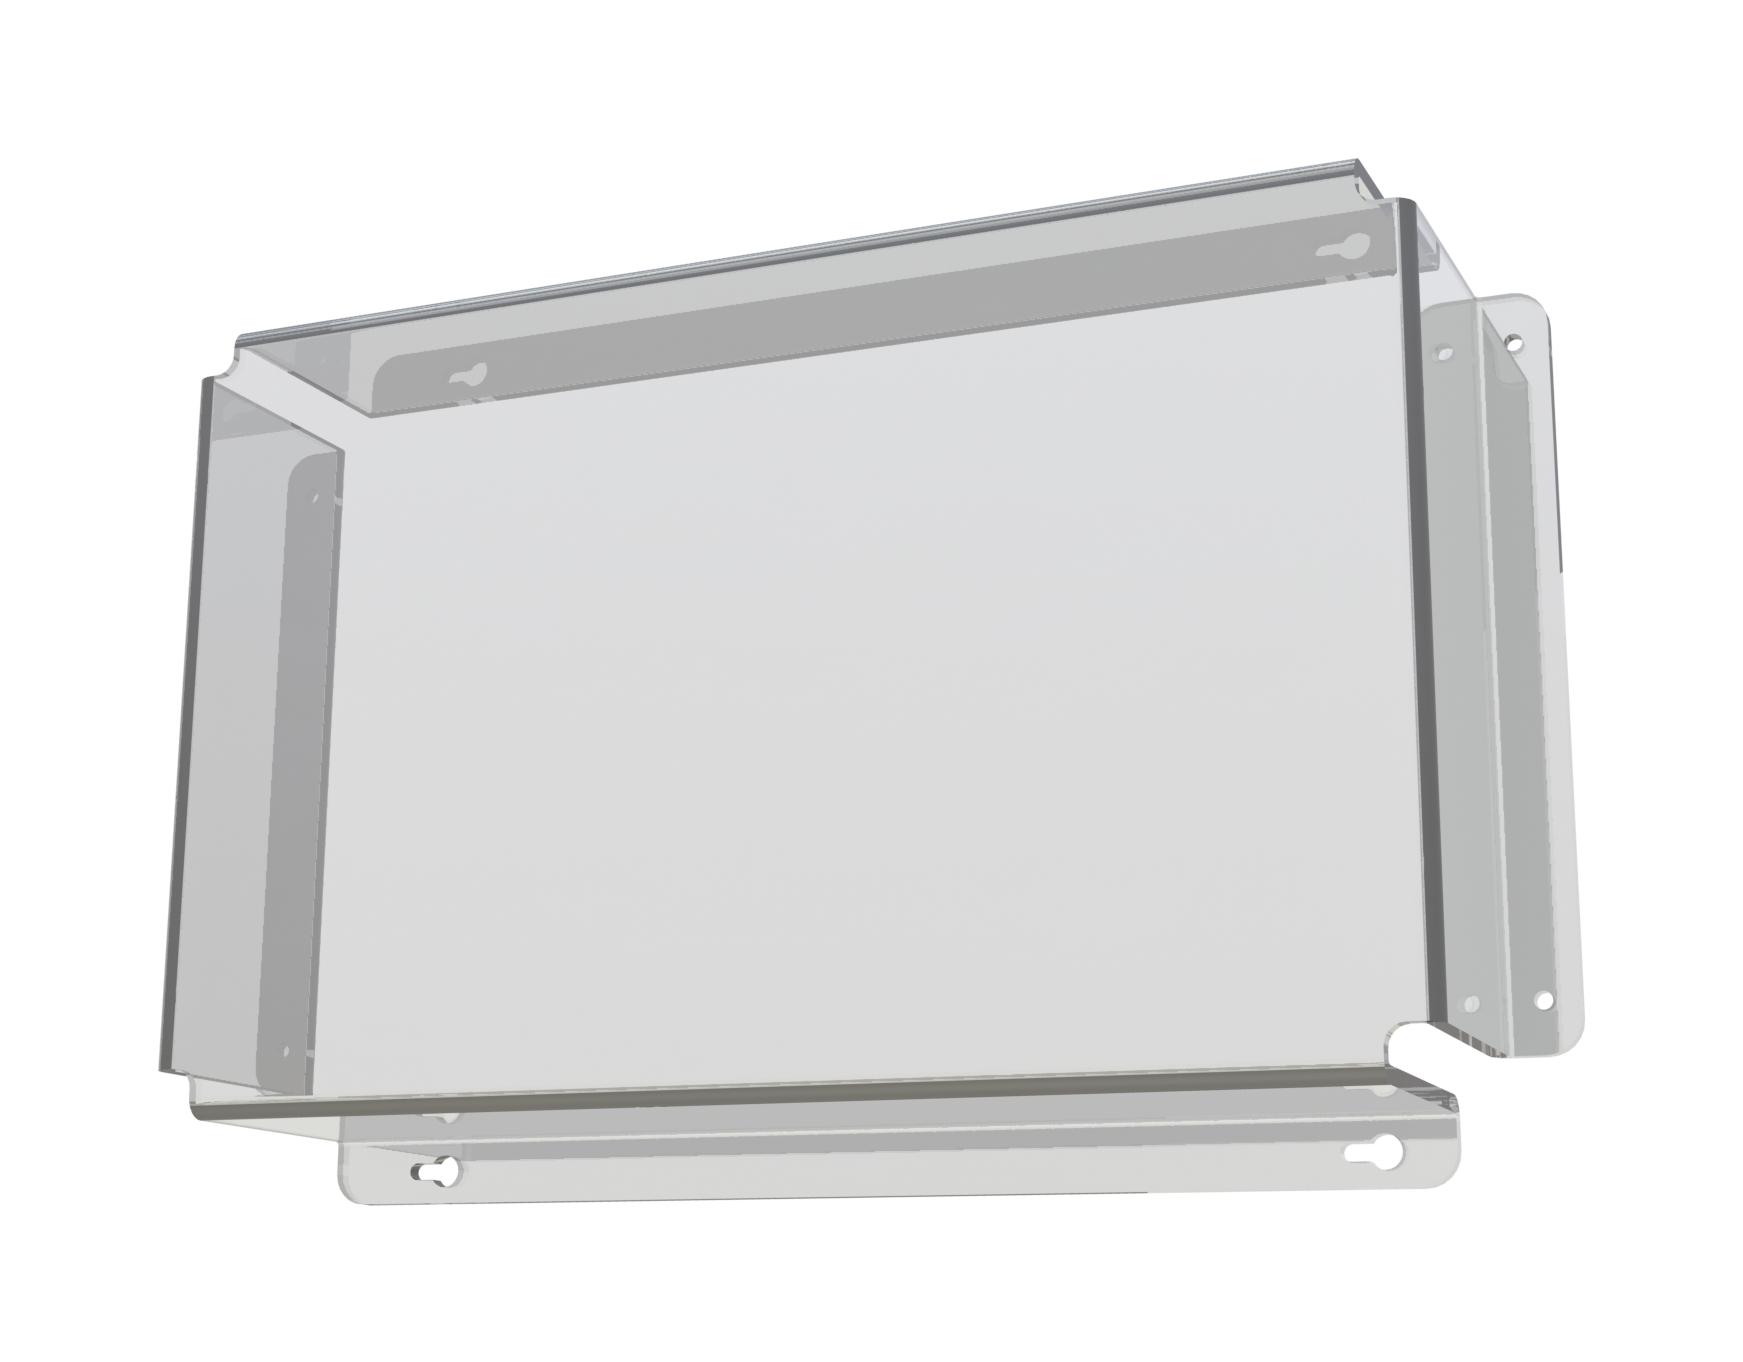 1 Stk Ballschutz aus Plexiglas LxBxH=430x290x88mm Wandstärke 5mm NLBALLPLX1